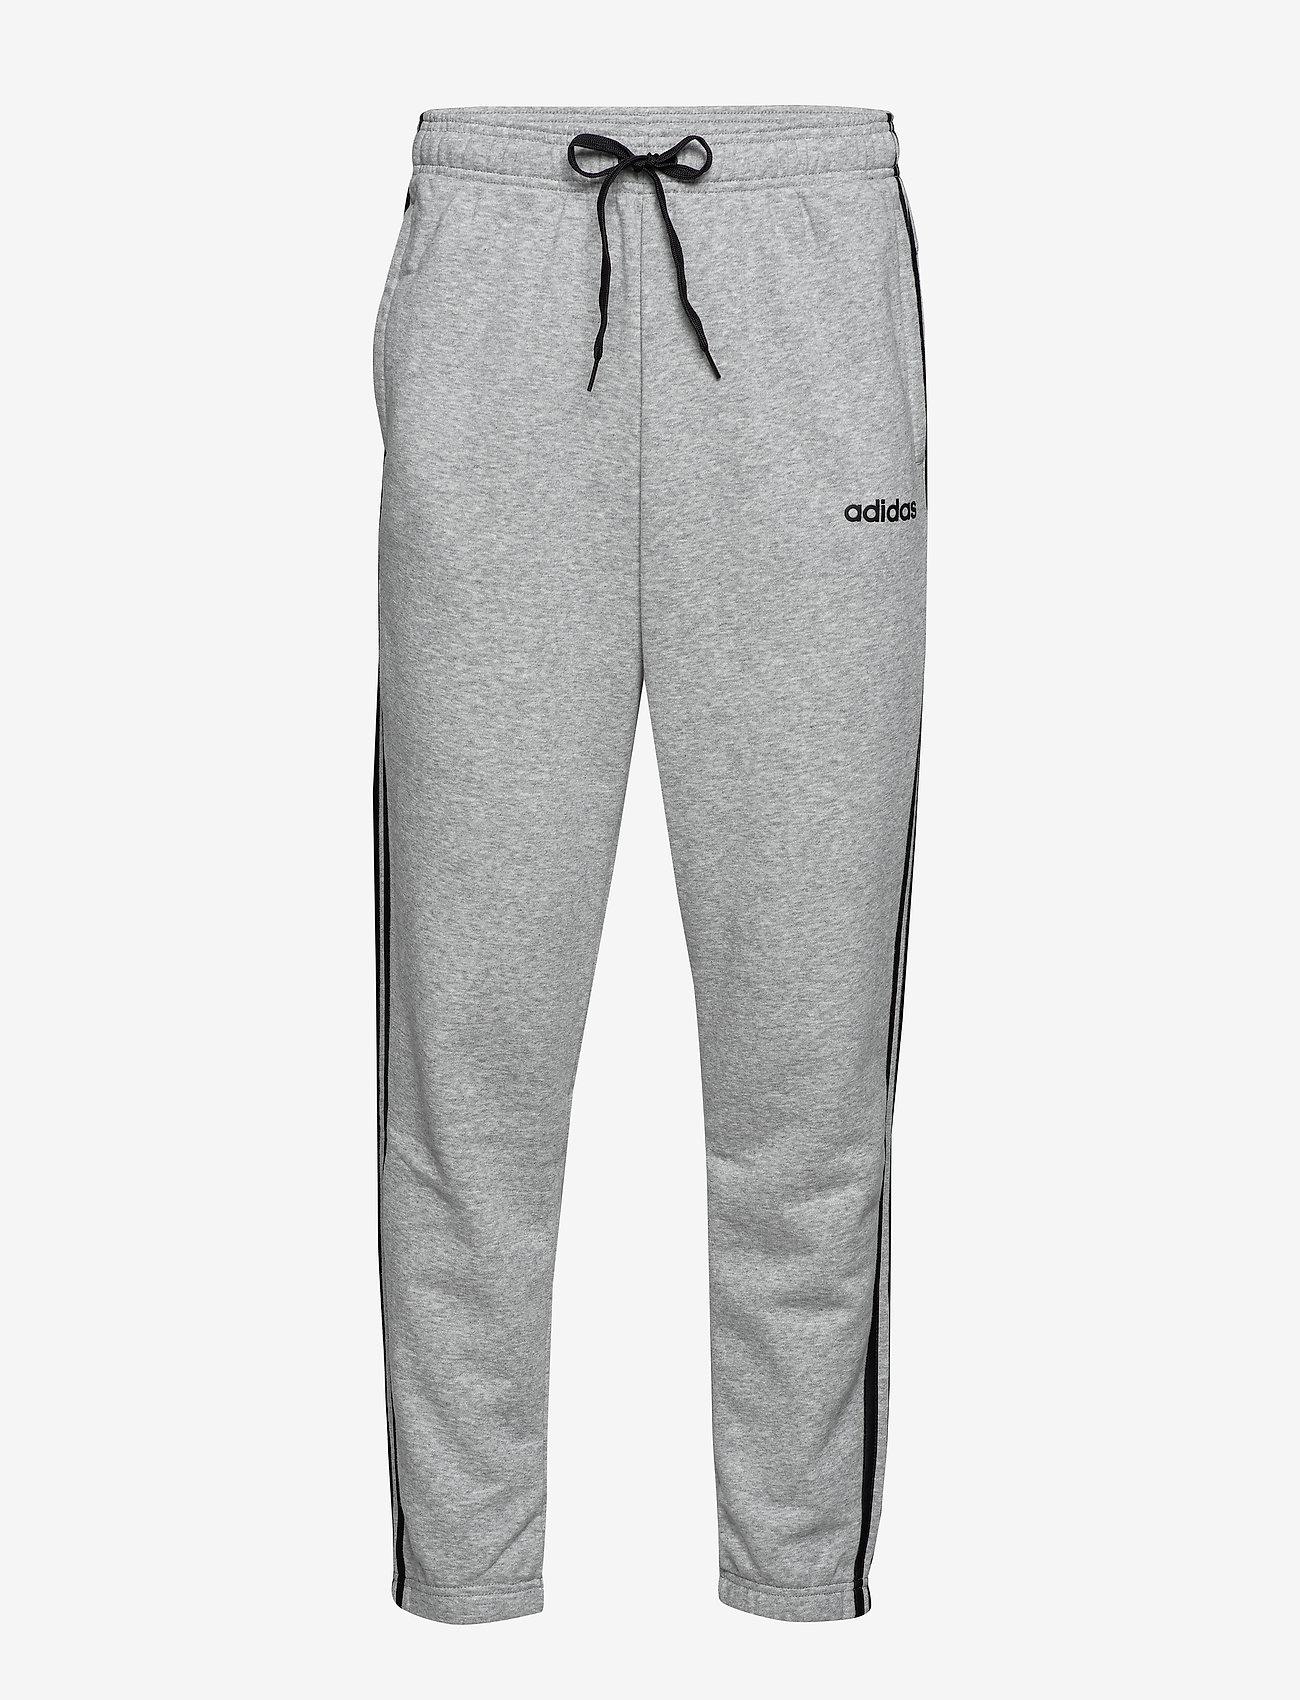 adidas Performance - E 3S T PNT FT - pants - mgreyh/black - 0